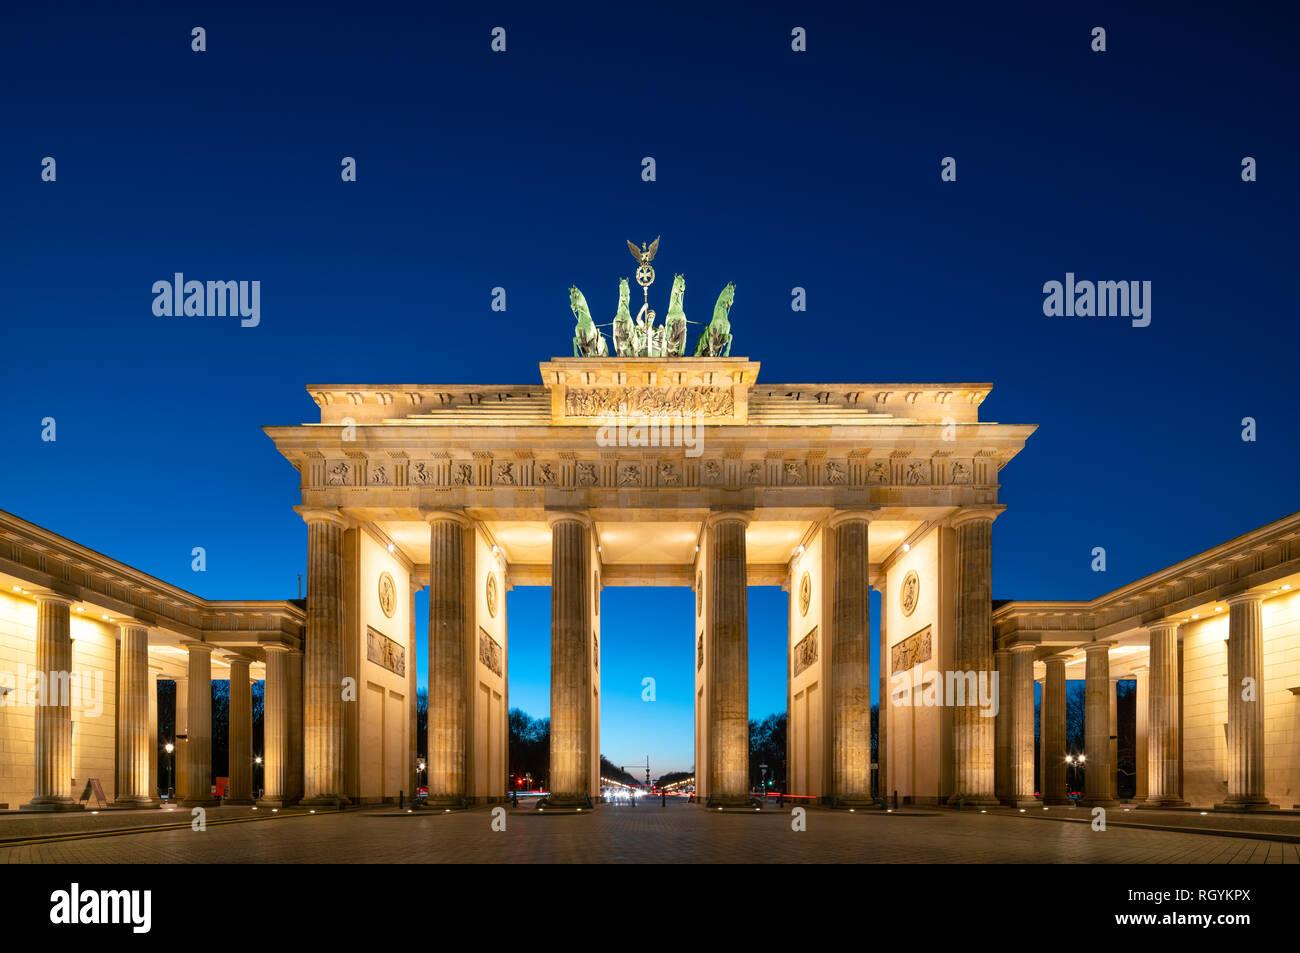 Berlino Germania Berlin Brandenburg Gate, Berlin Brandenburger Tor, Berlin Pariser Platz. Foto Stock